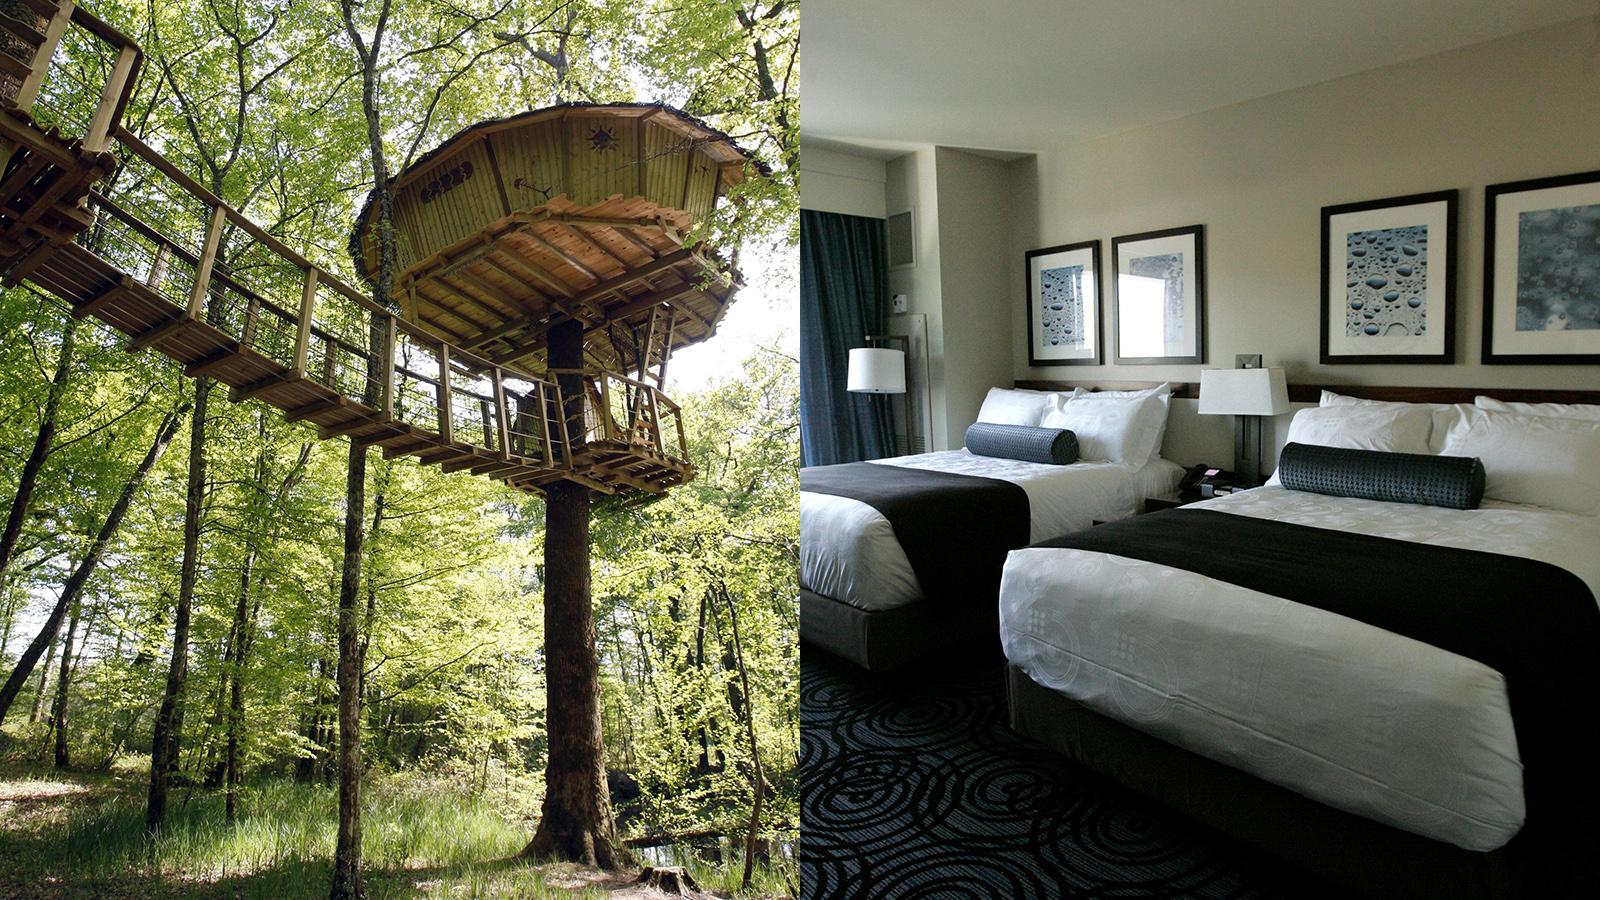 tree house versus hotel room